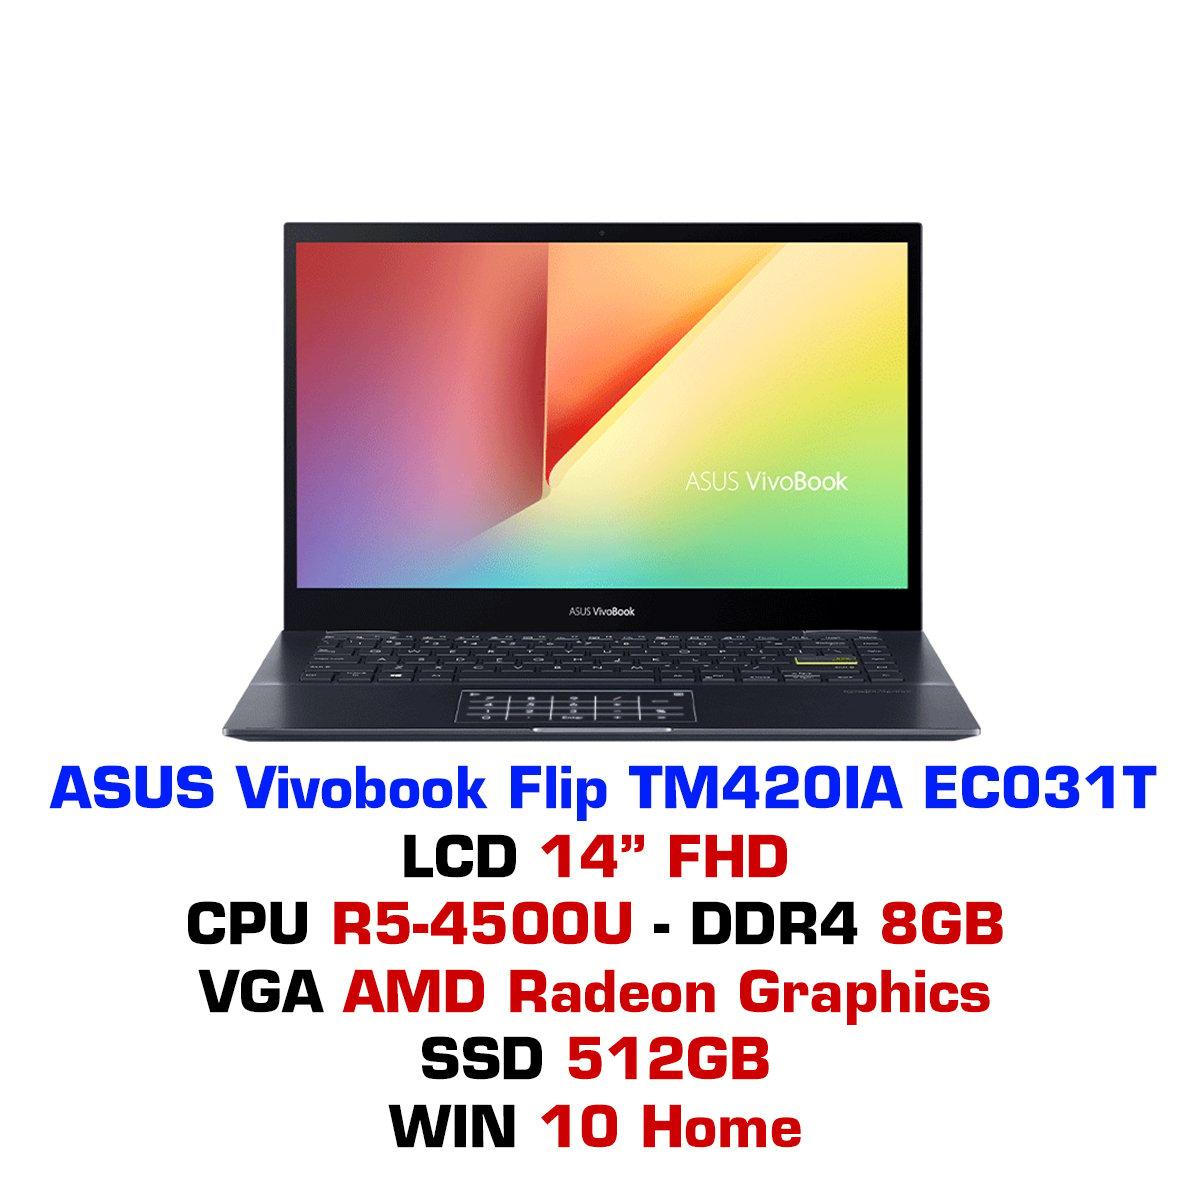 Laptop ASUS Vivobook Flip TM420IA EC031T